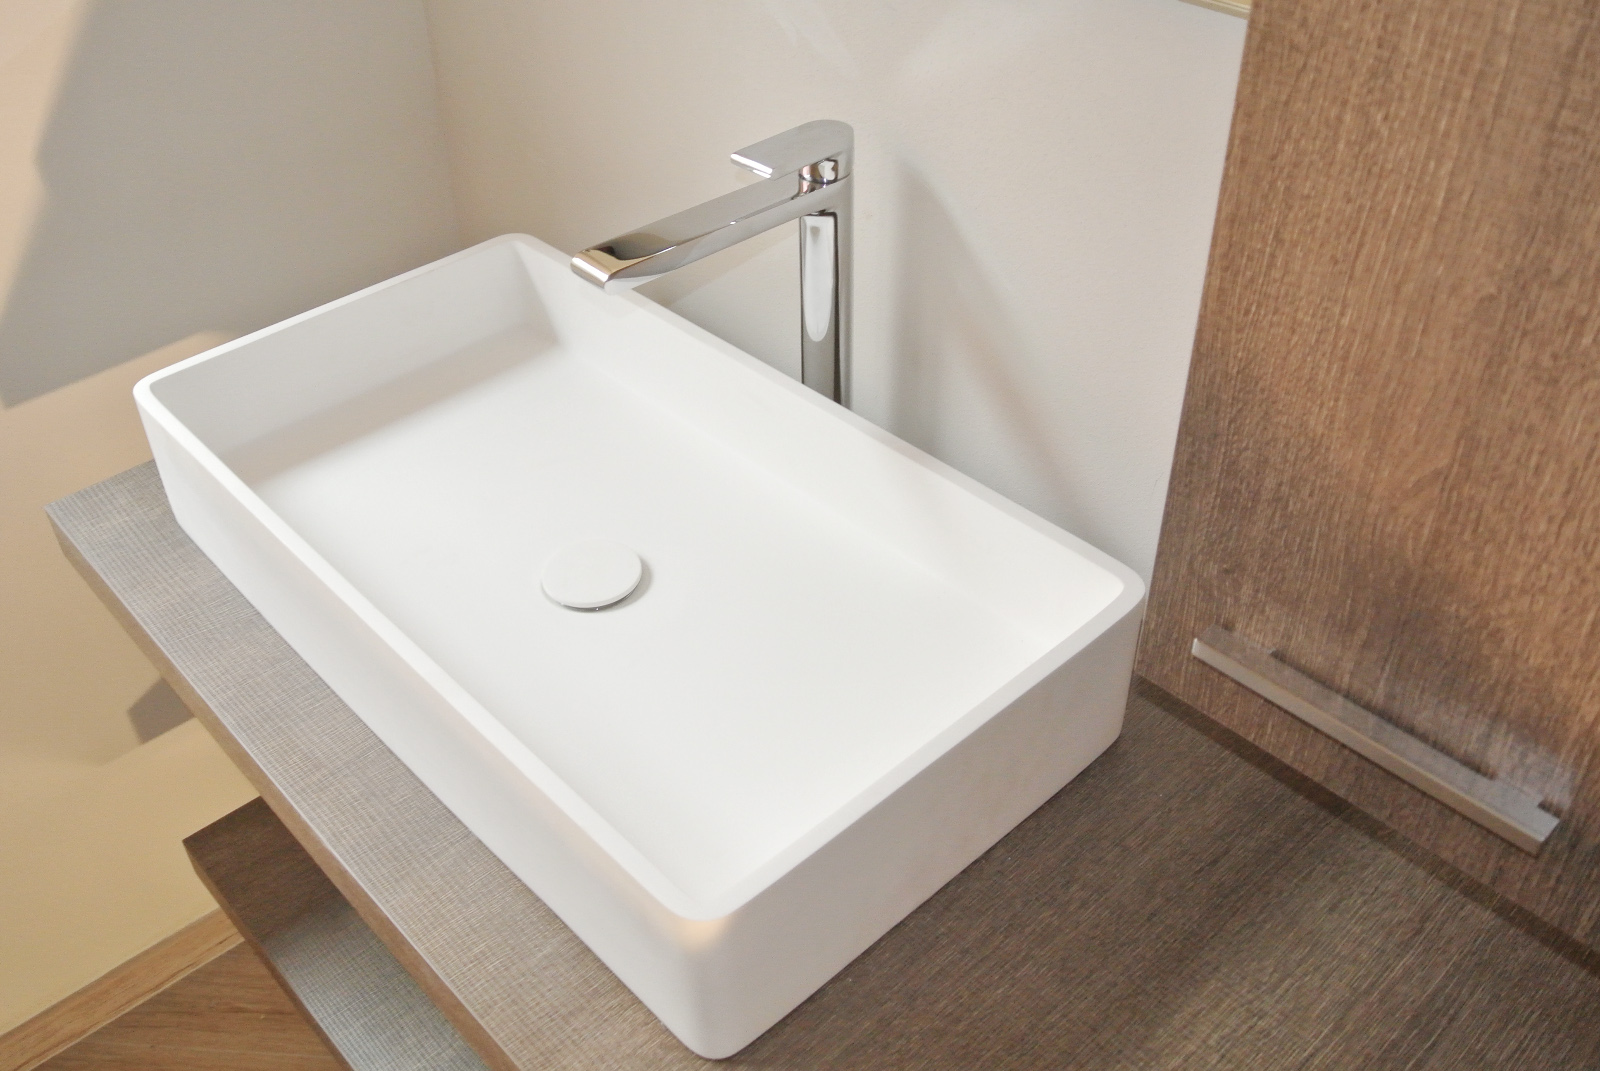 sintesibagno-verbania-arredobagno-lavabo-corian-miscelatore-lavabo-prolungato-bpnomi-bonny-puntotre